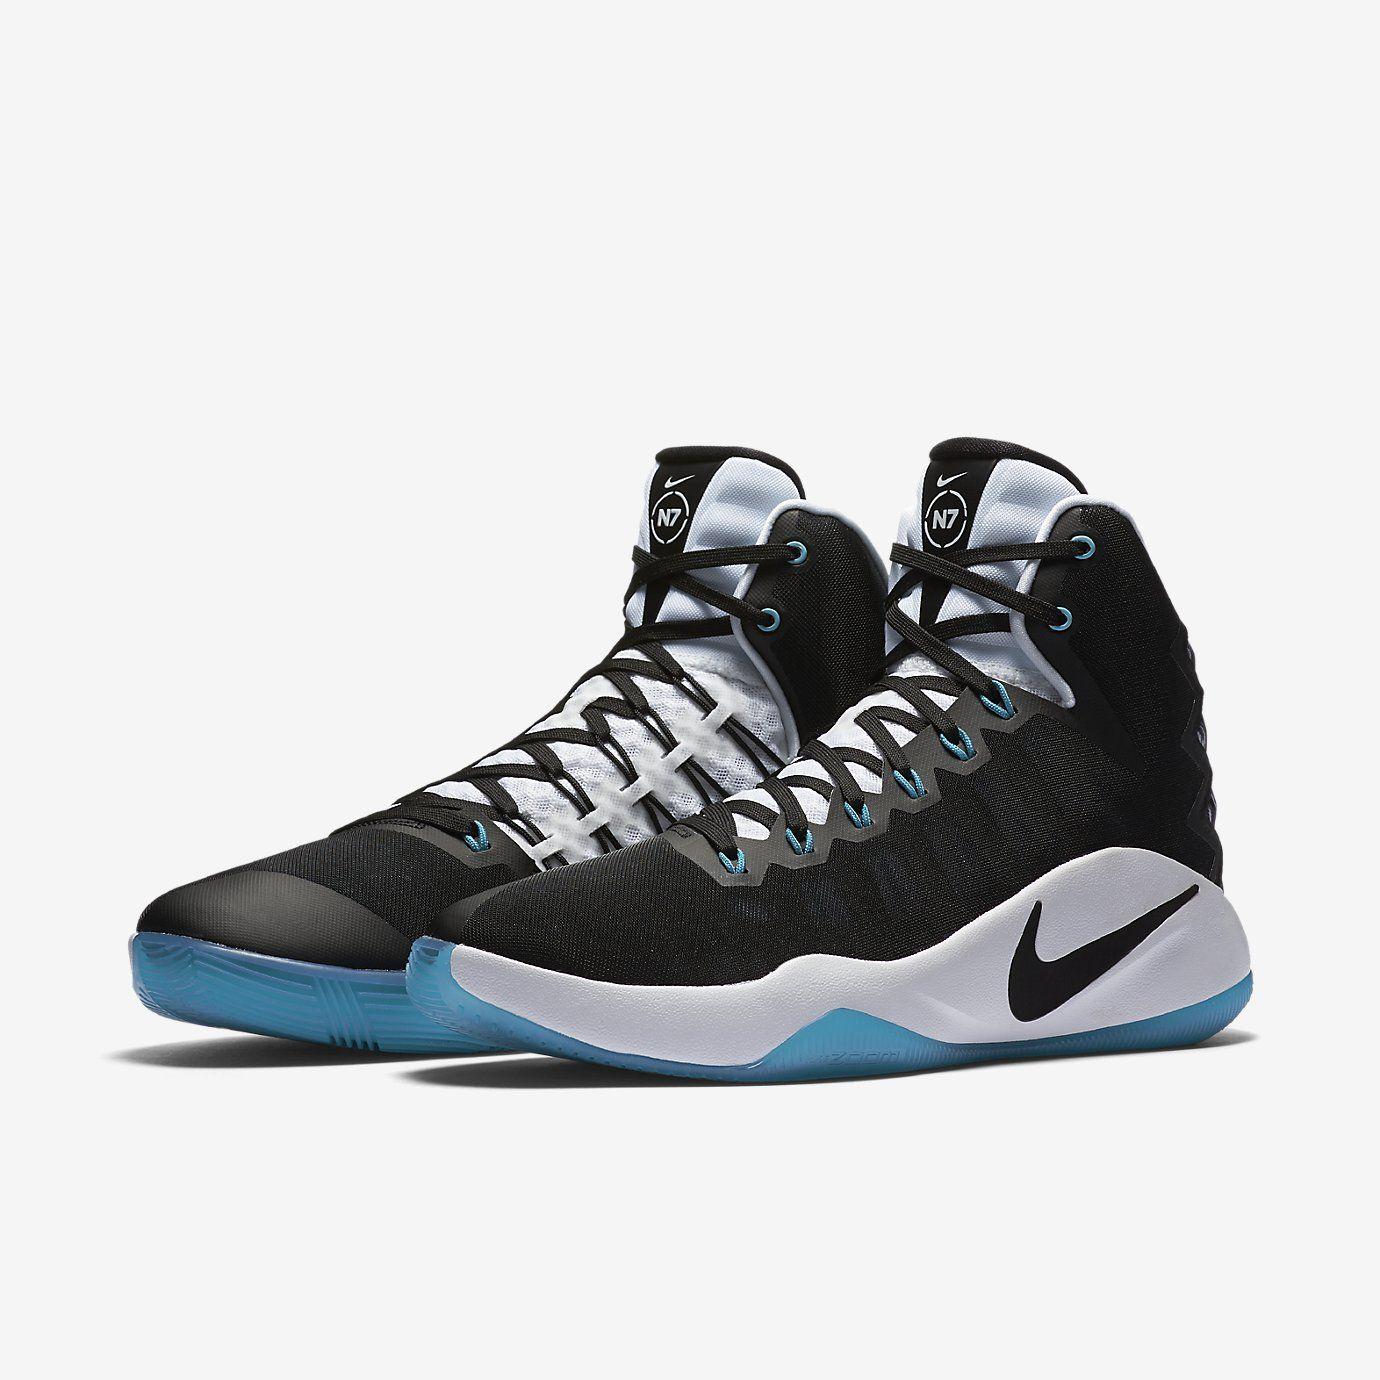 huge selection of 5c207 d9874 Nike Hyperdunk 2016 Premium N7 Men s Basketball Shoe. Nike.com